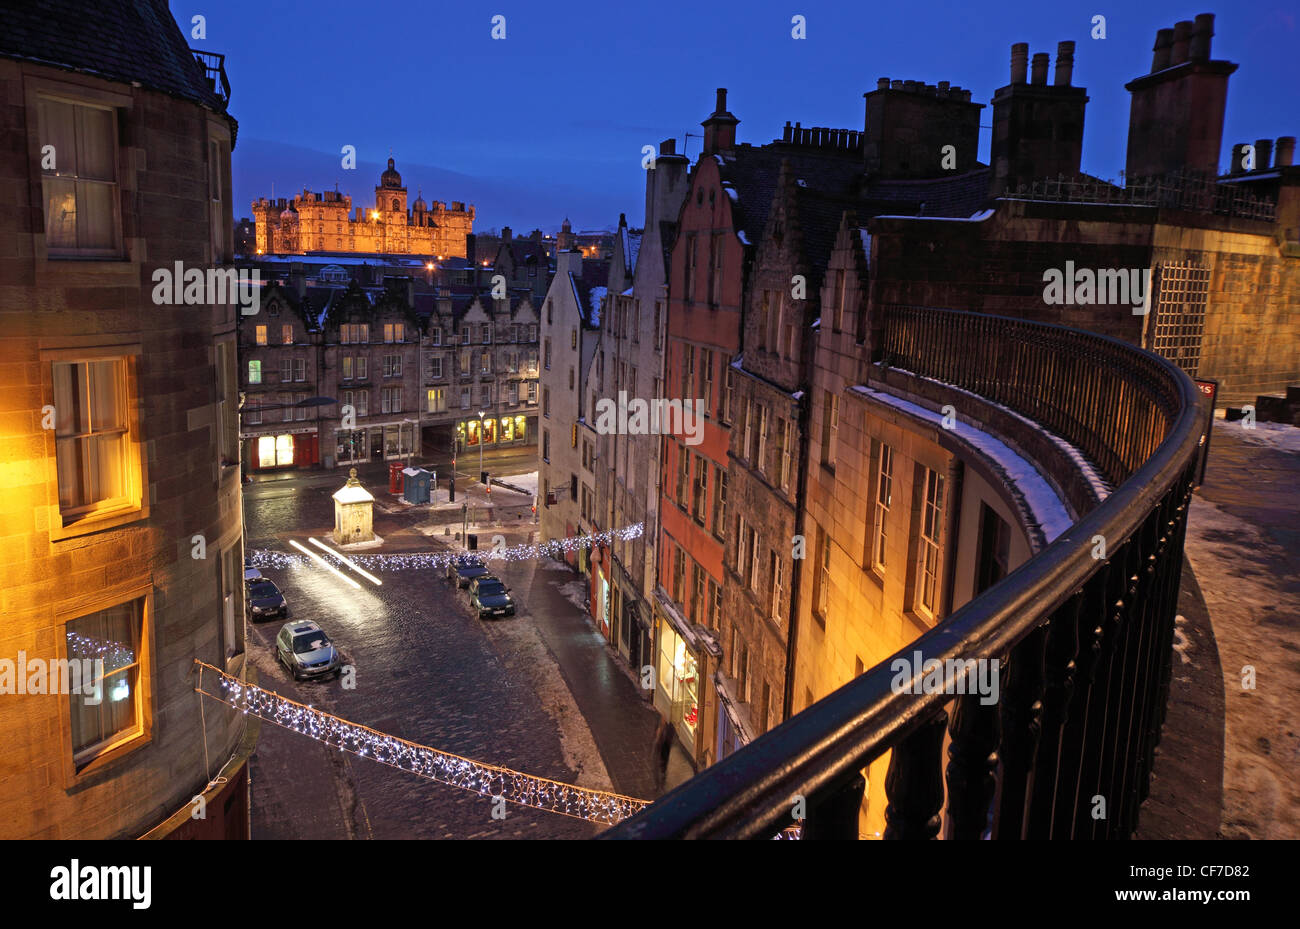 Scotland,night,dusk,shot,blue,hour,December,winter,stone,building,classic,sweep,sweeps,around,gotonysmith,old,town,oldtown,ice,icy,winter,cold,window,flat,flats,tenements,city,centre,evening,night,time,nighttime,lights,mixed,lighting,best,sexy,great,thebest,historic,history,scottish,independance,LEcosse,Edimbourg,Schotland,Schottland,La,Scozia,Edimburgo,Escocia,Edimburgo,scottish,independance,independence,home,rule,devolution,parliament,SNP,national,party,@Hotpixuk,Government,2014,Scots,vote,voting,gotonysmith,Tour,tourist,tourism,tourist,attraction,Scotland,Capital,City,Scots,Scottish,icon,iconic,@Hotpixuk,HotpixUk,Buy Pictures of,Buy Images Of,Buy Pictures of,Buy Images Of,Tourist Attraction,city Centre,Scotlands History,Scotlands History